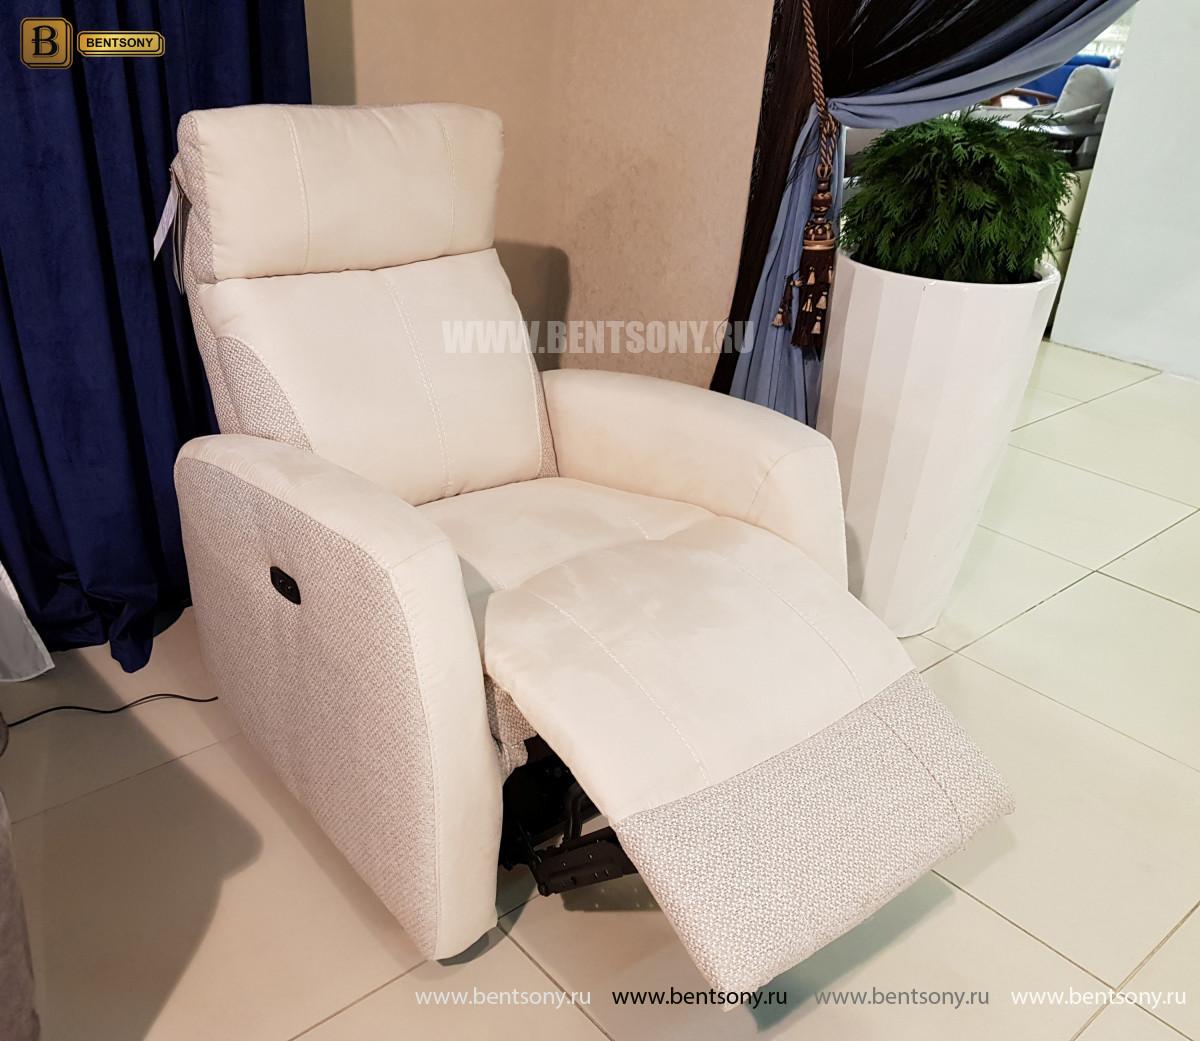 Кресло Эдвард с электрореклайнером каталог мебели